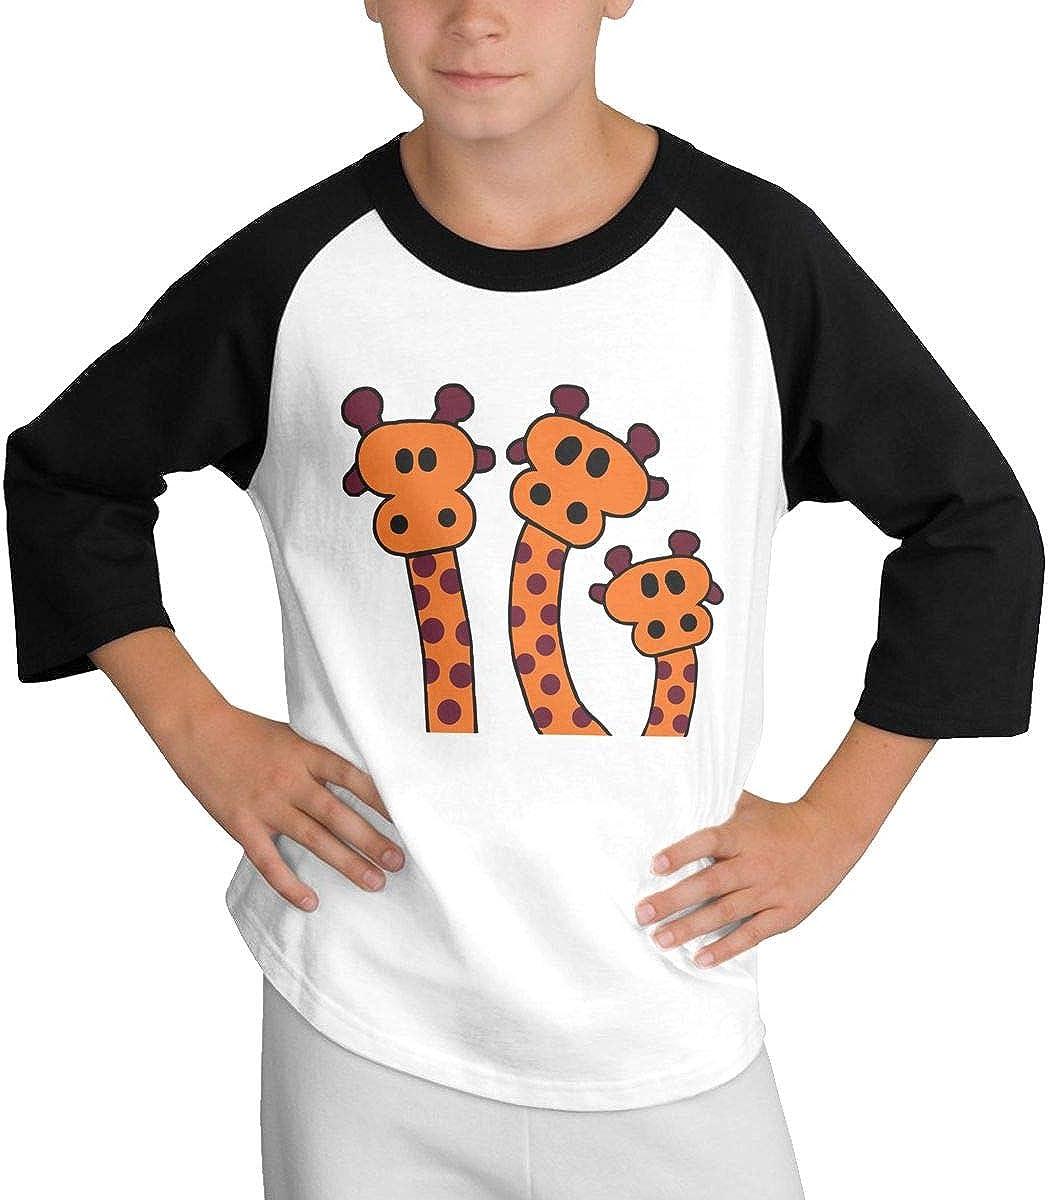 Qiop Nee Cartoon Giraffes Raglan 3//4 Short-Sleeve T Shirts Youth Girl Boys